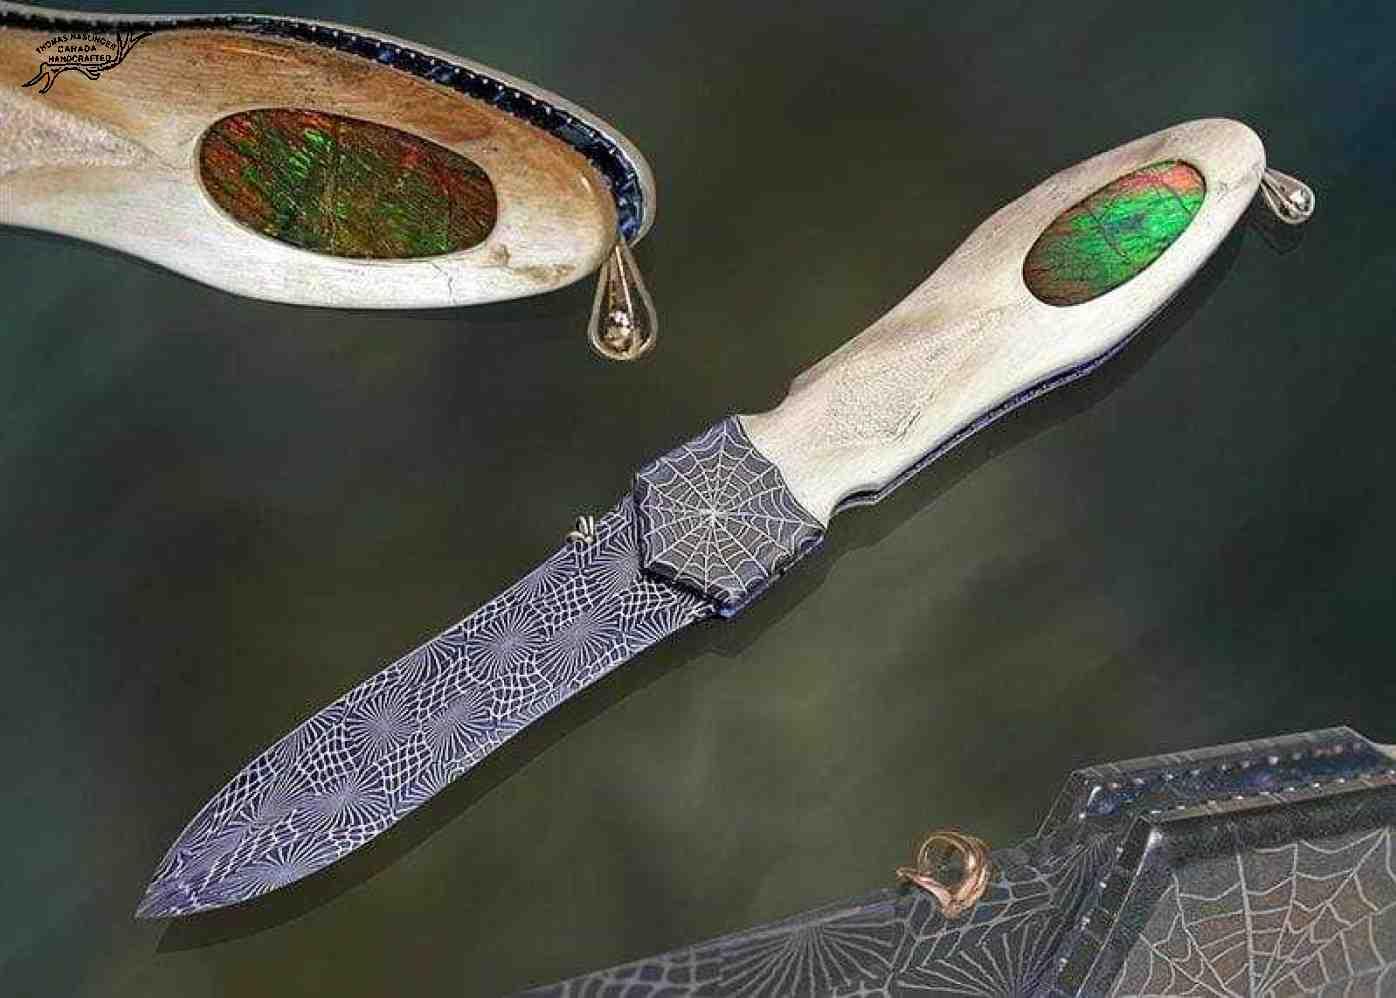 Ammonite dagger with invisible screw construction